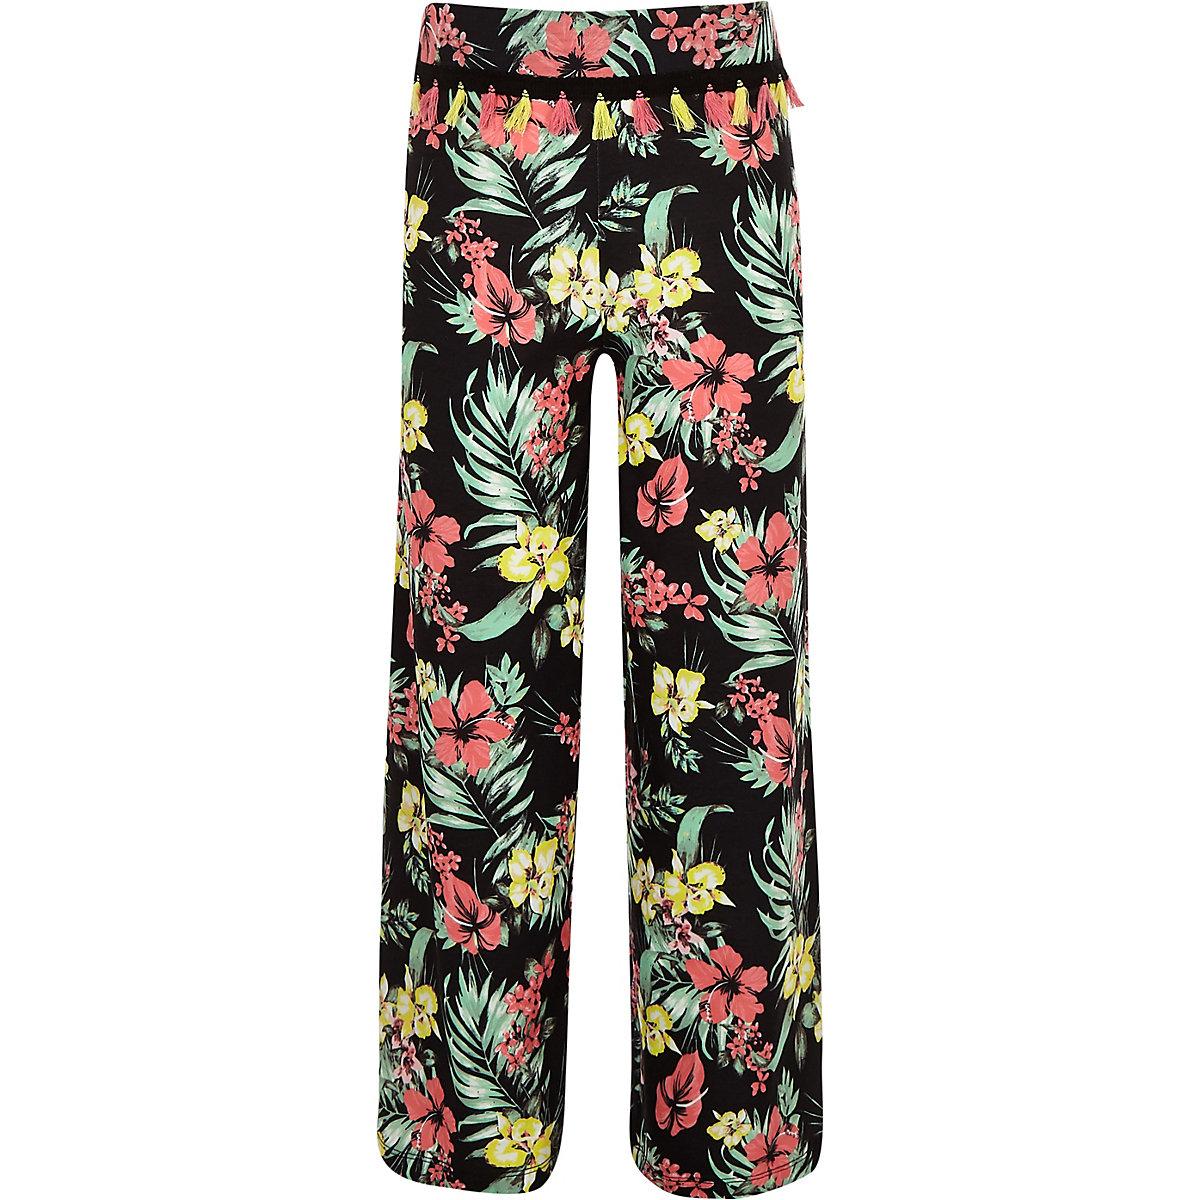 Girls black floral wide leg pants